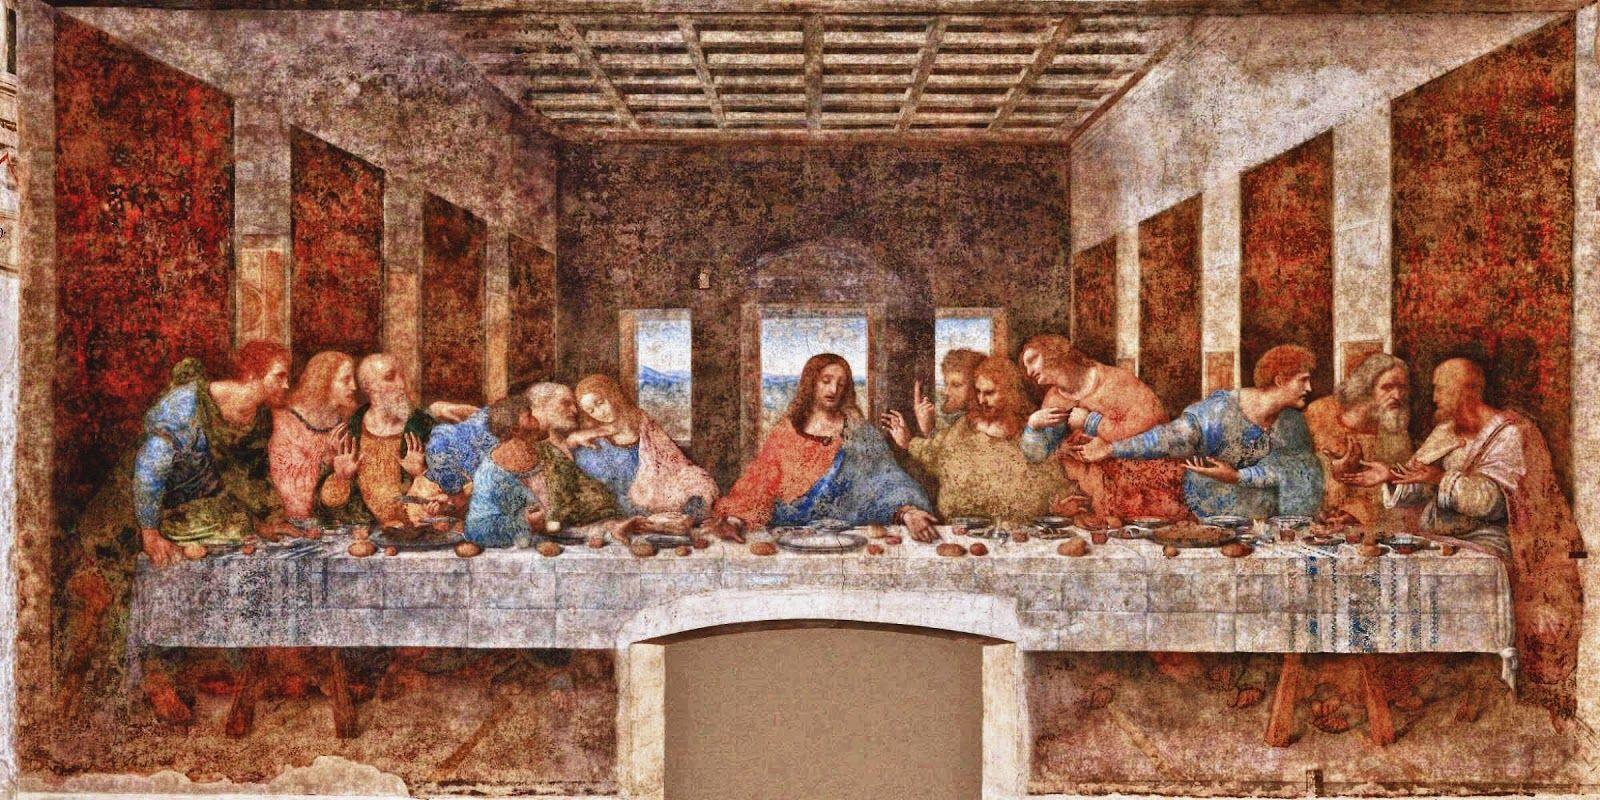 A Ultima Ceia Leonardo Da Vinci Dimensoes 4 6 M X 8 8 M